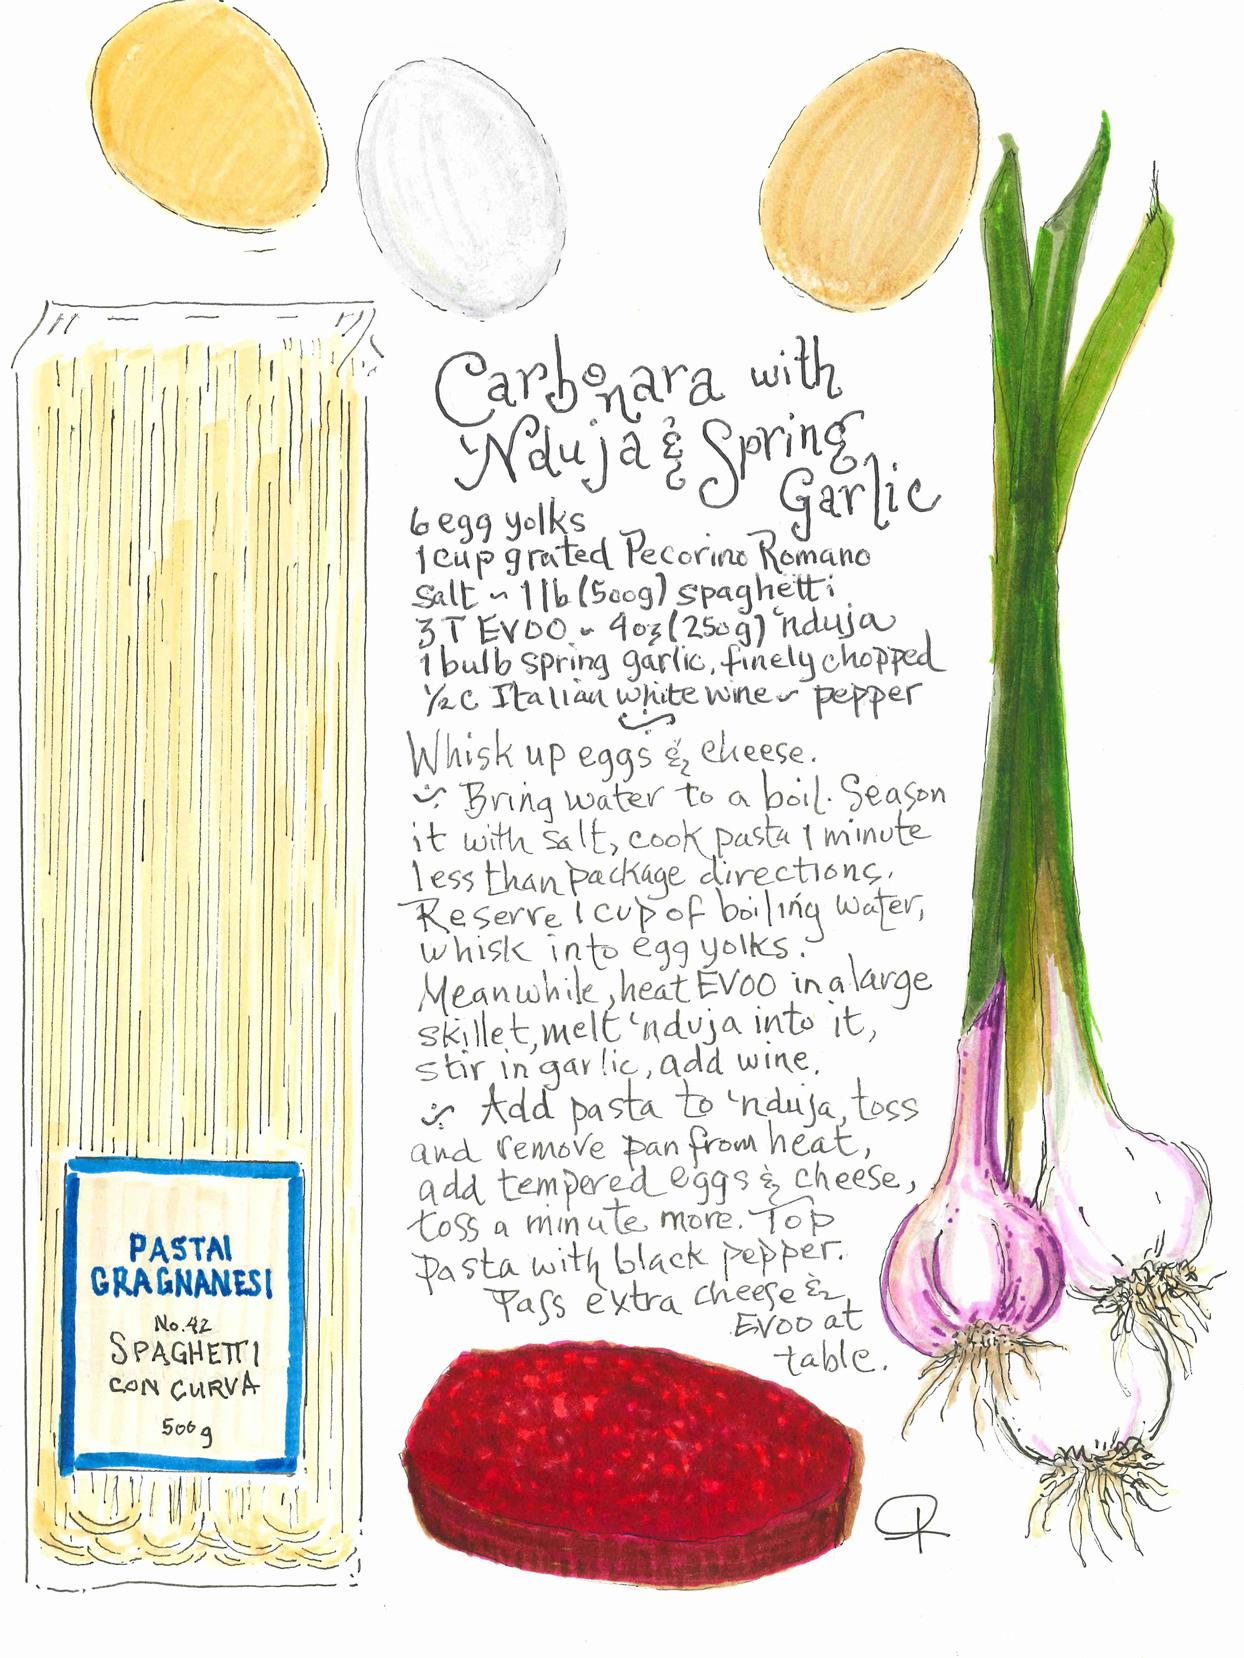 carbonara with 'nduja and spring garlic